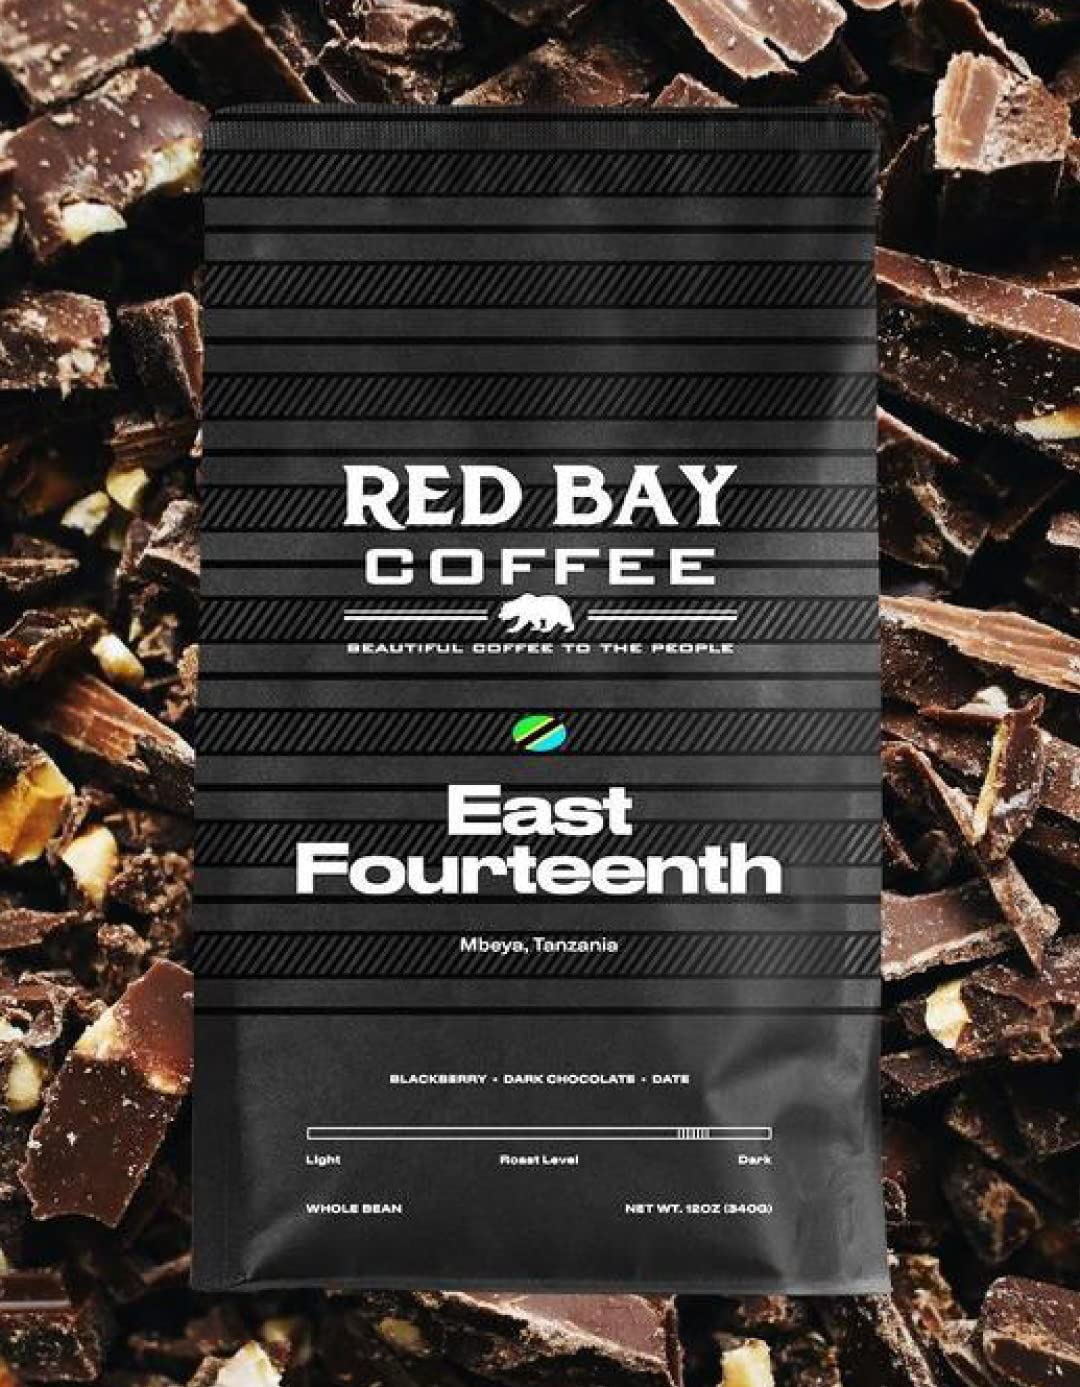 EastFourteenth_RedBayCoffee